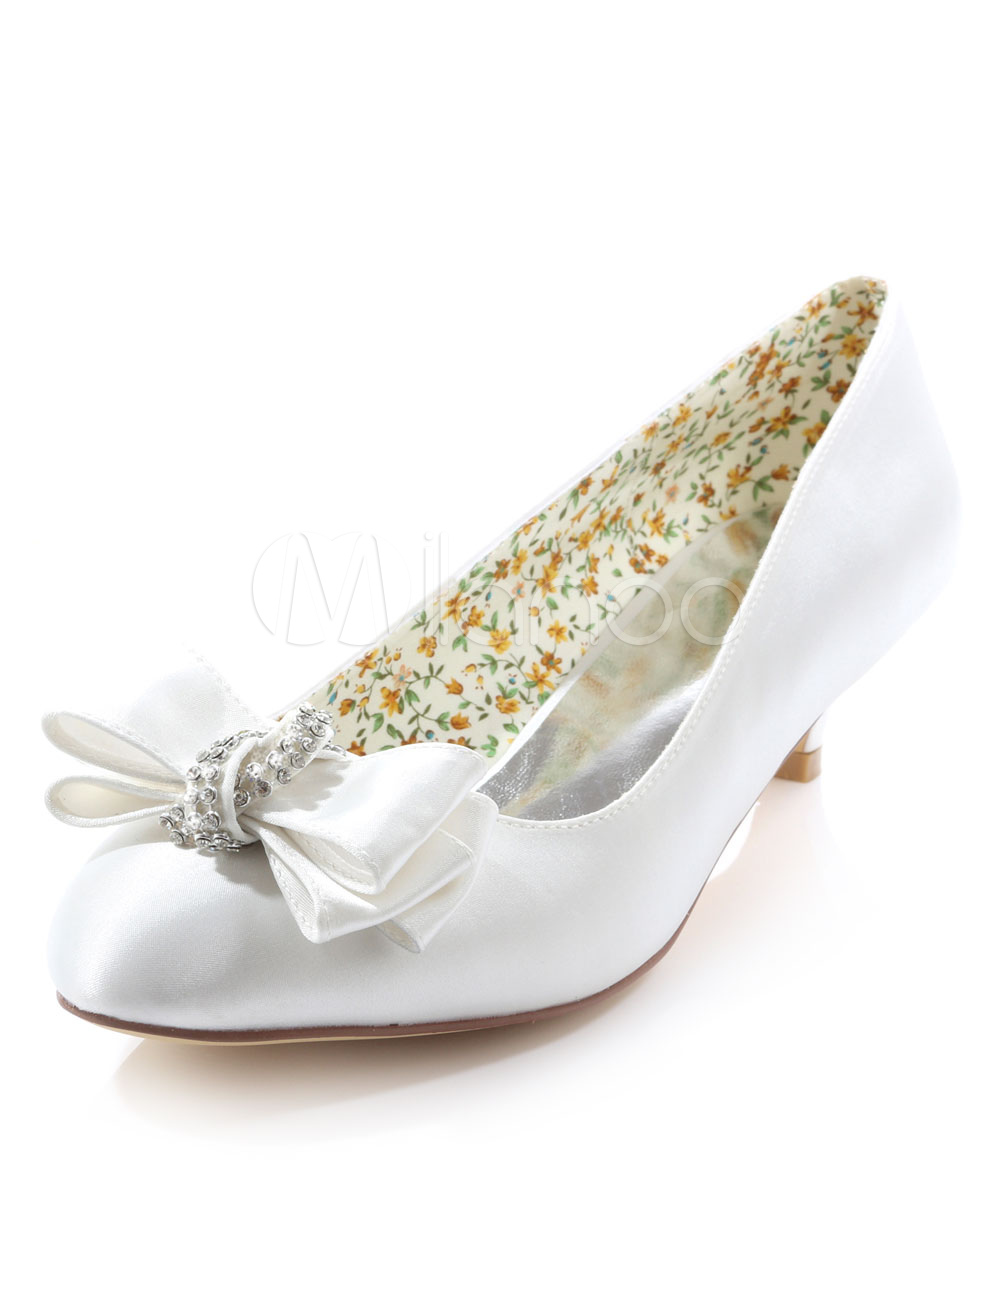 White Bridal Pumps Bow Print Rhinestone Satin Wedding Heels